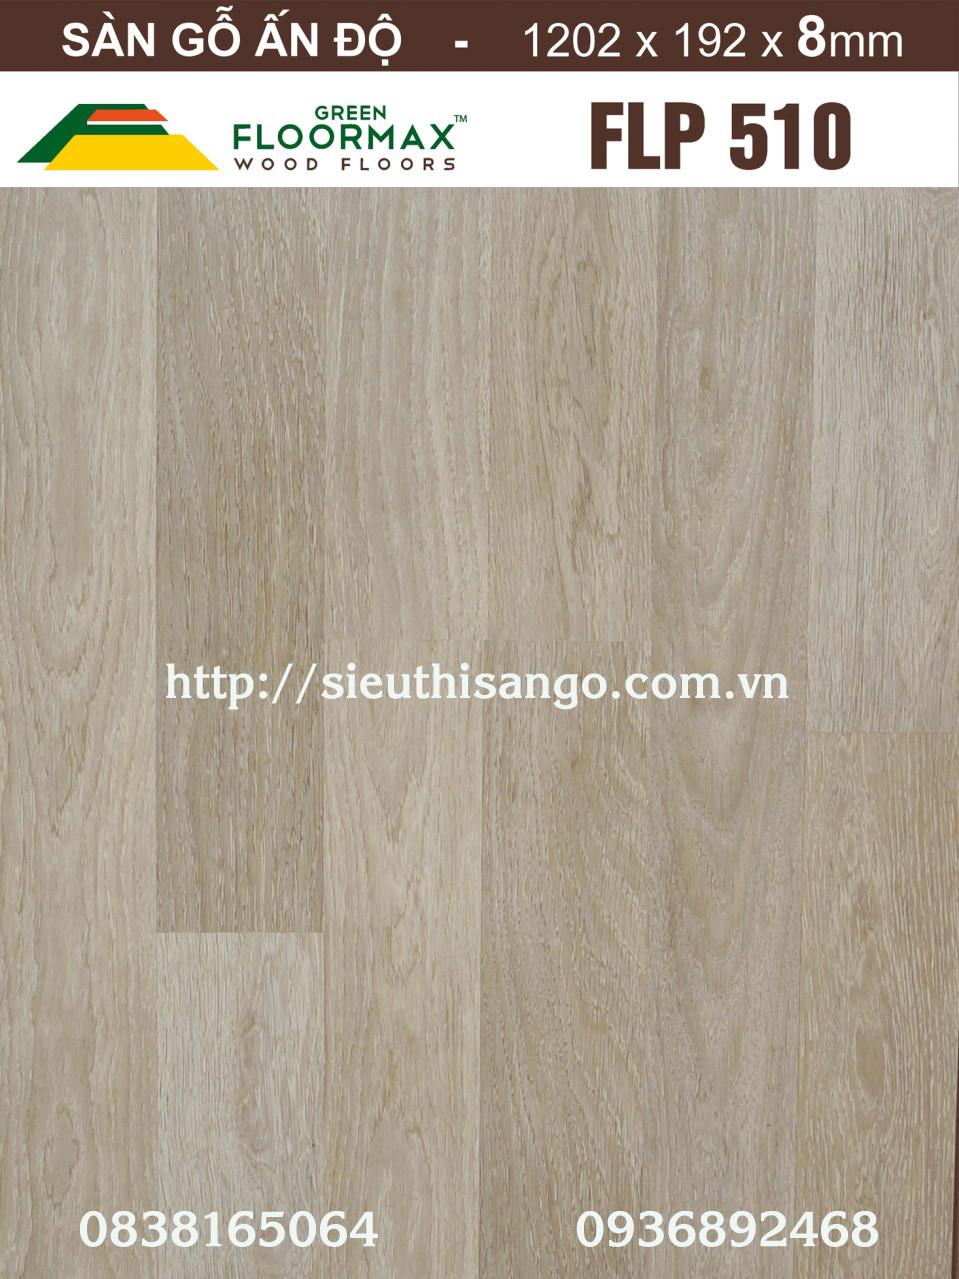 SÀN GỖ GREEN FLOORMAX FLP510